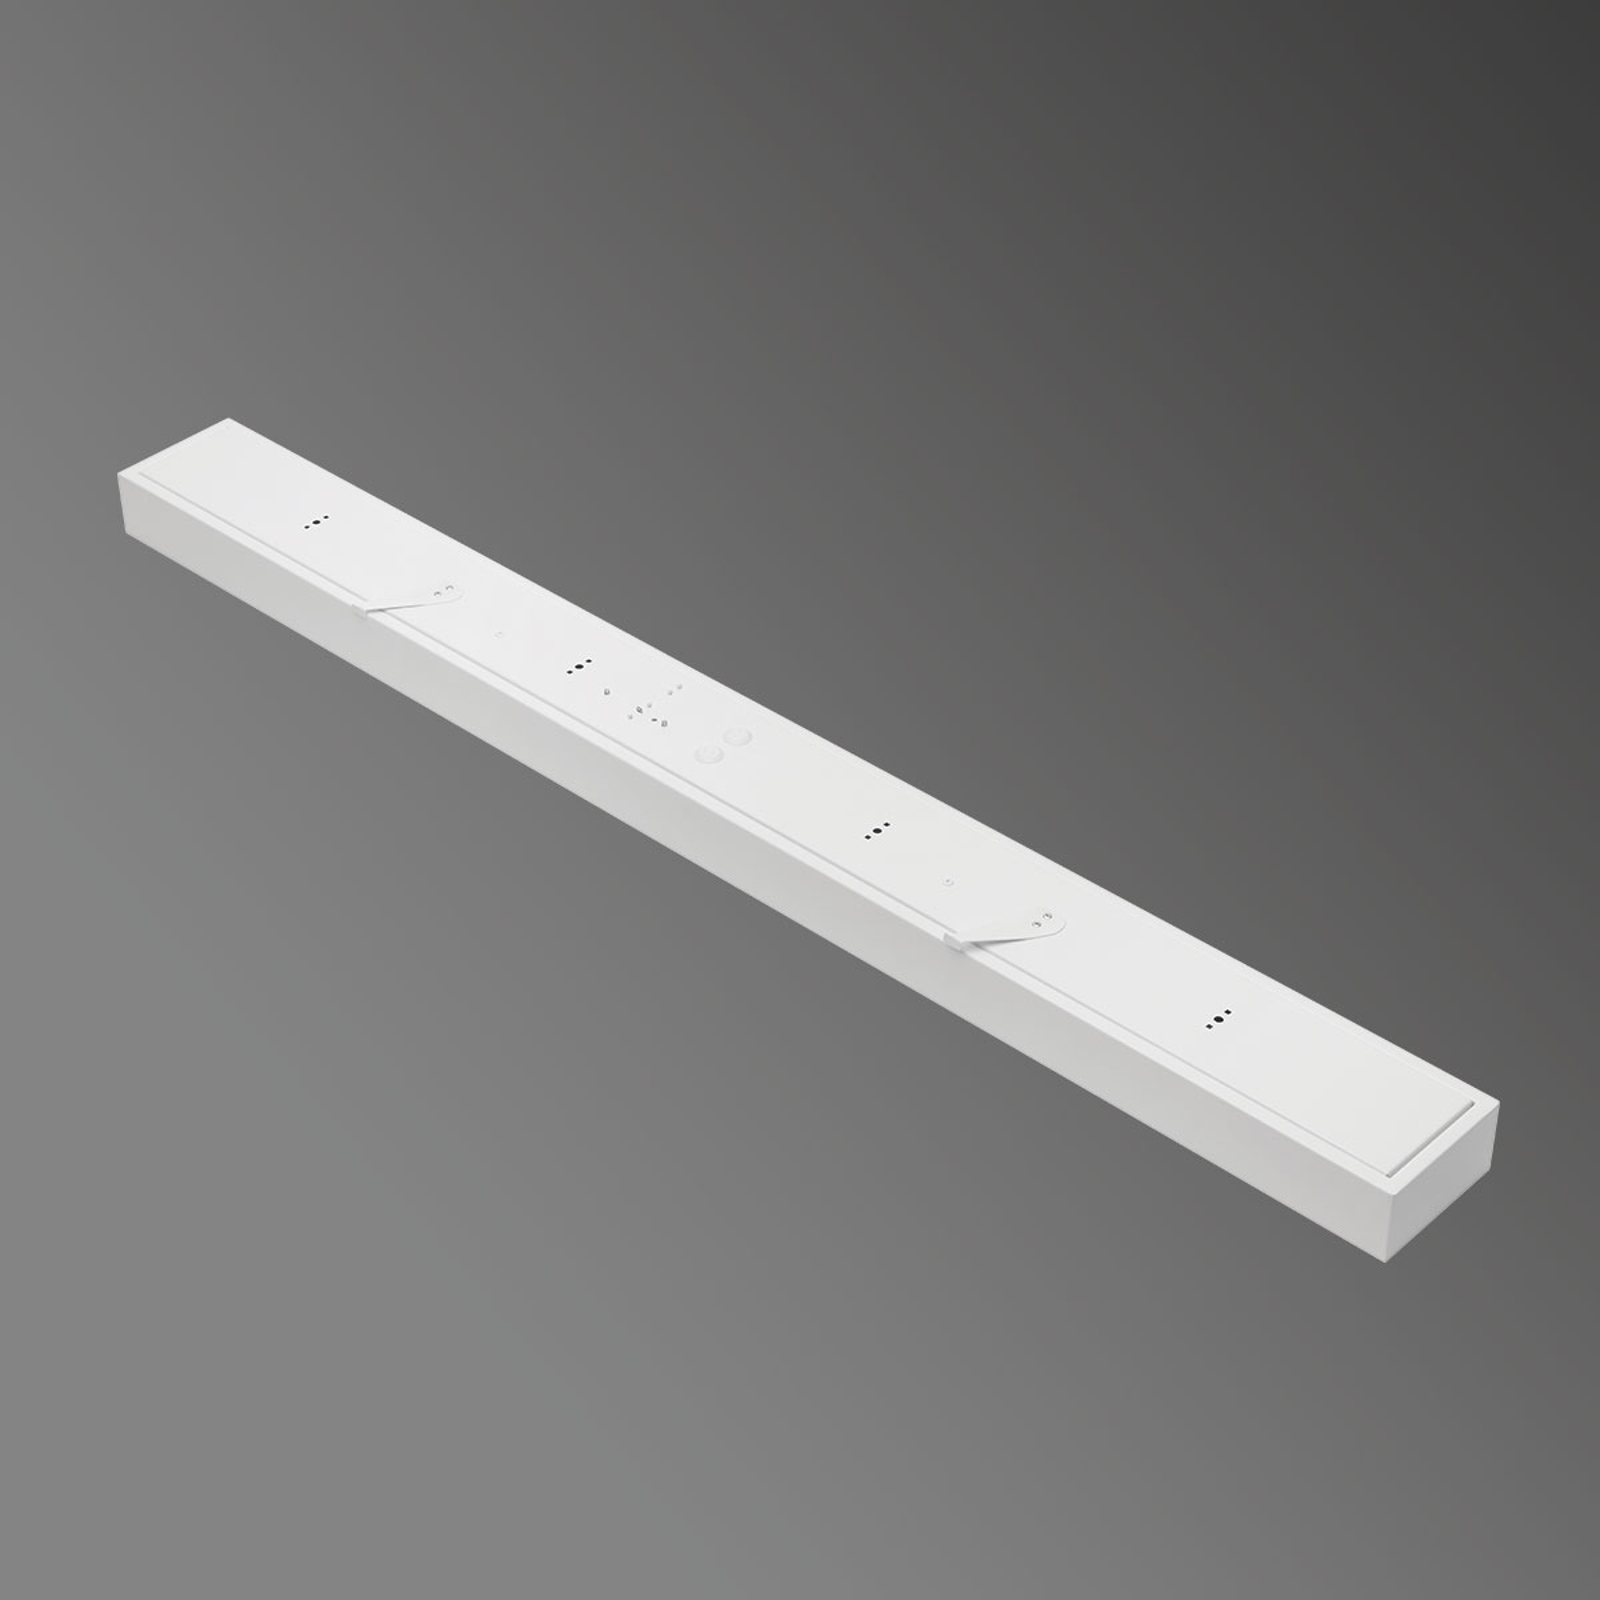 Lambda LED DIF SFD M LED-Deckenleuchte, 3.000K